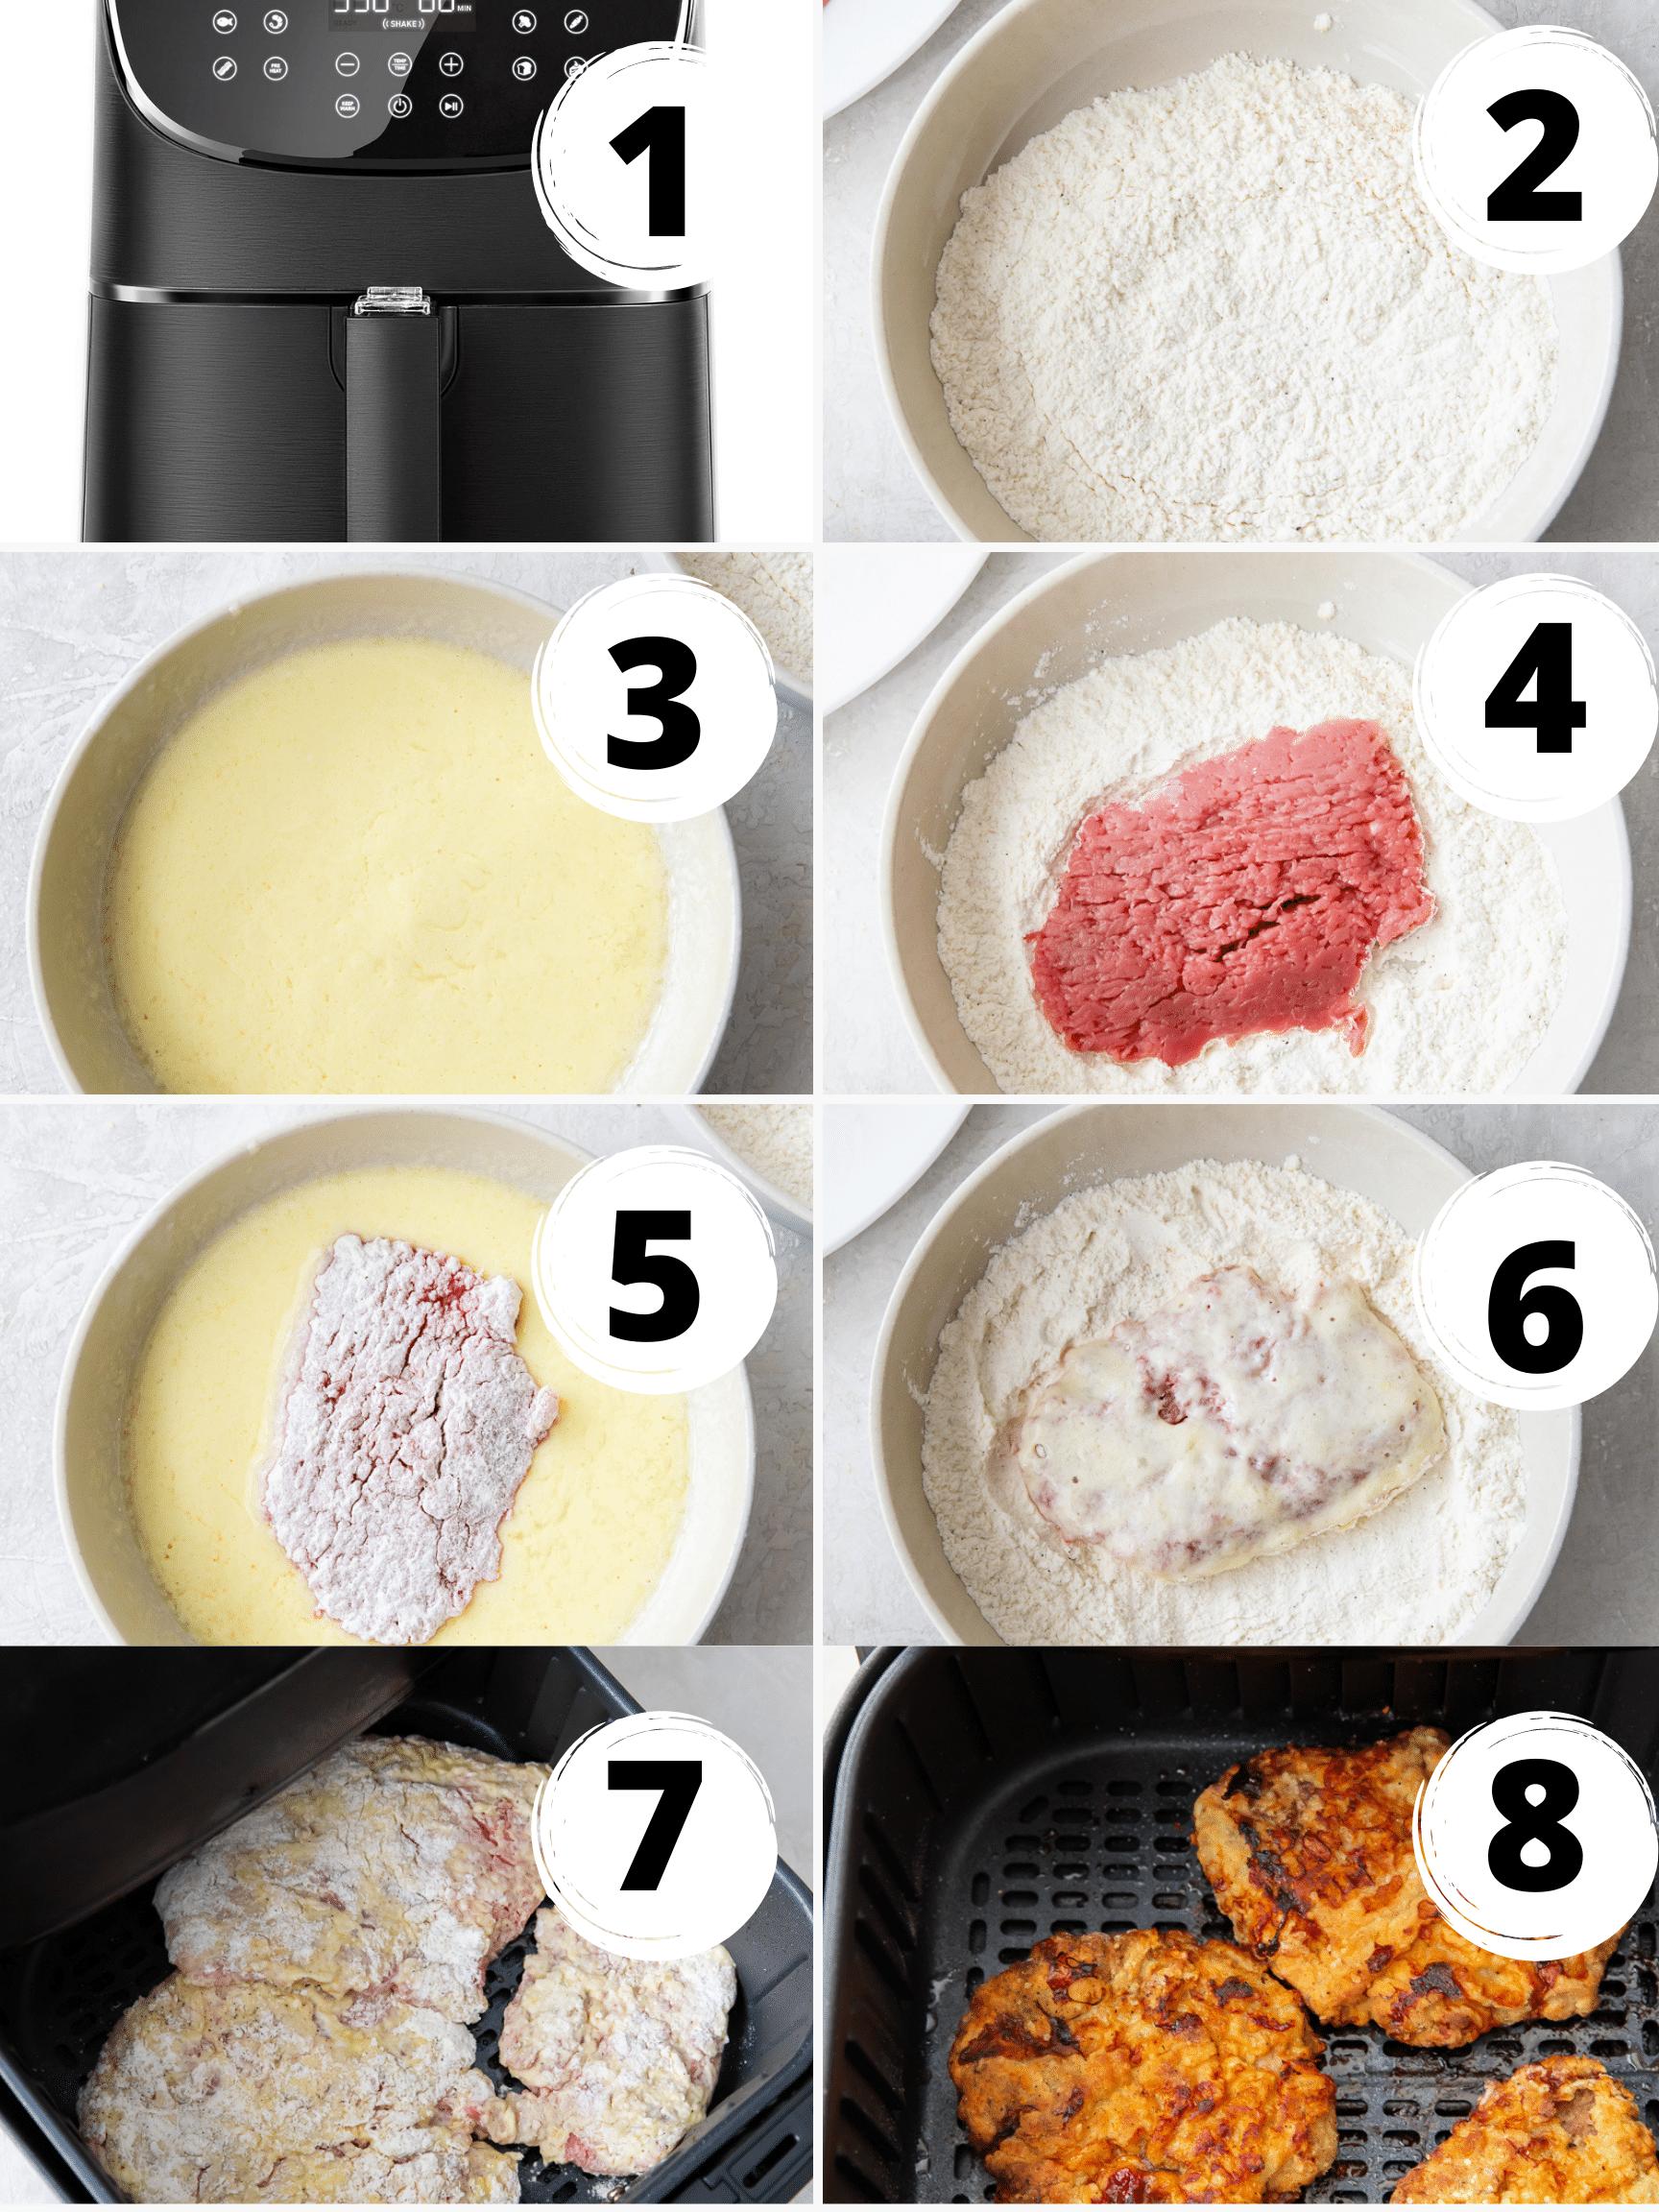 photo collage showing 8 steps needed to make air fryer chicken fried steak.